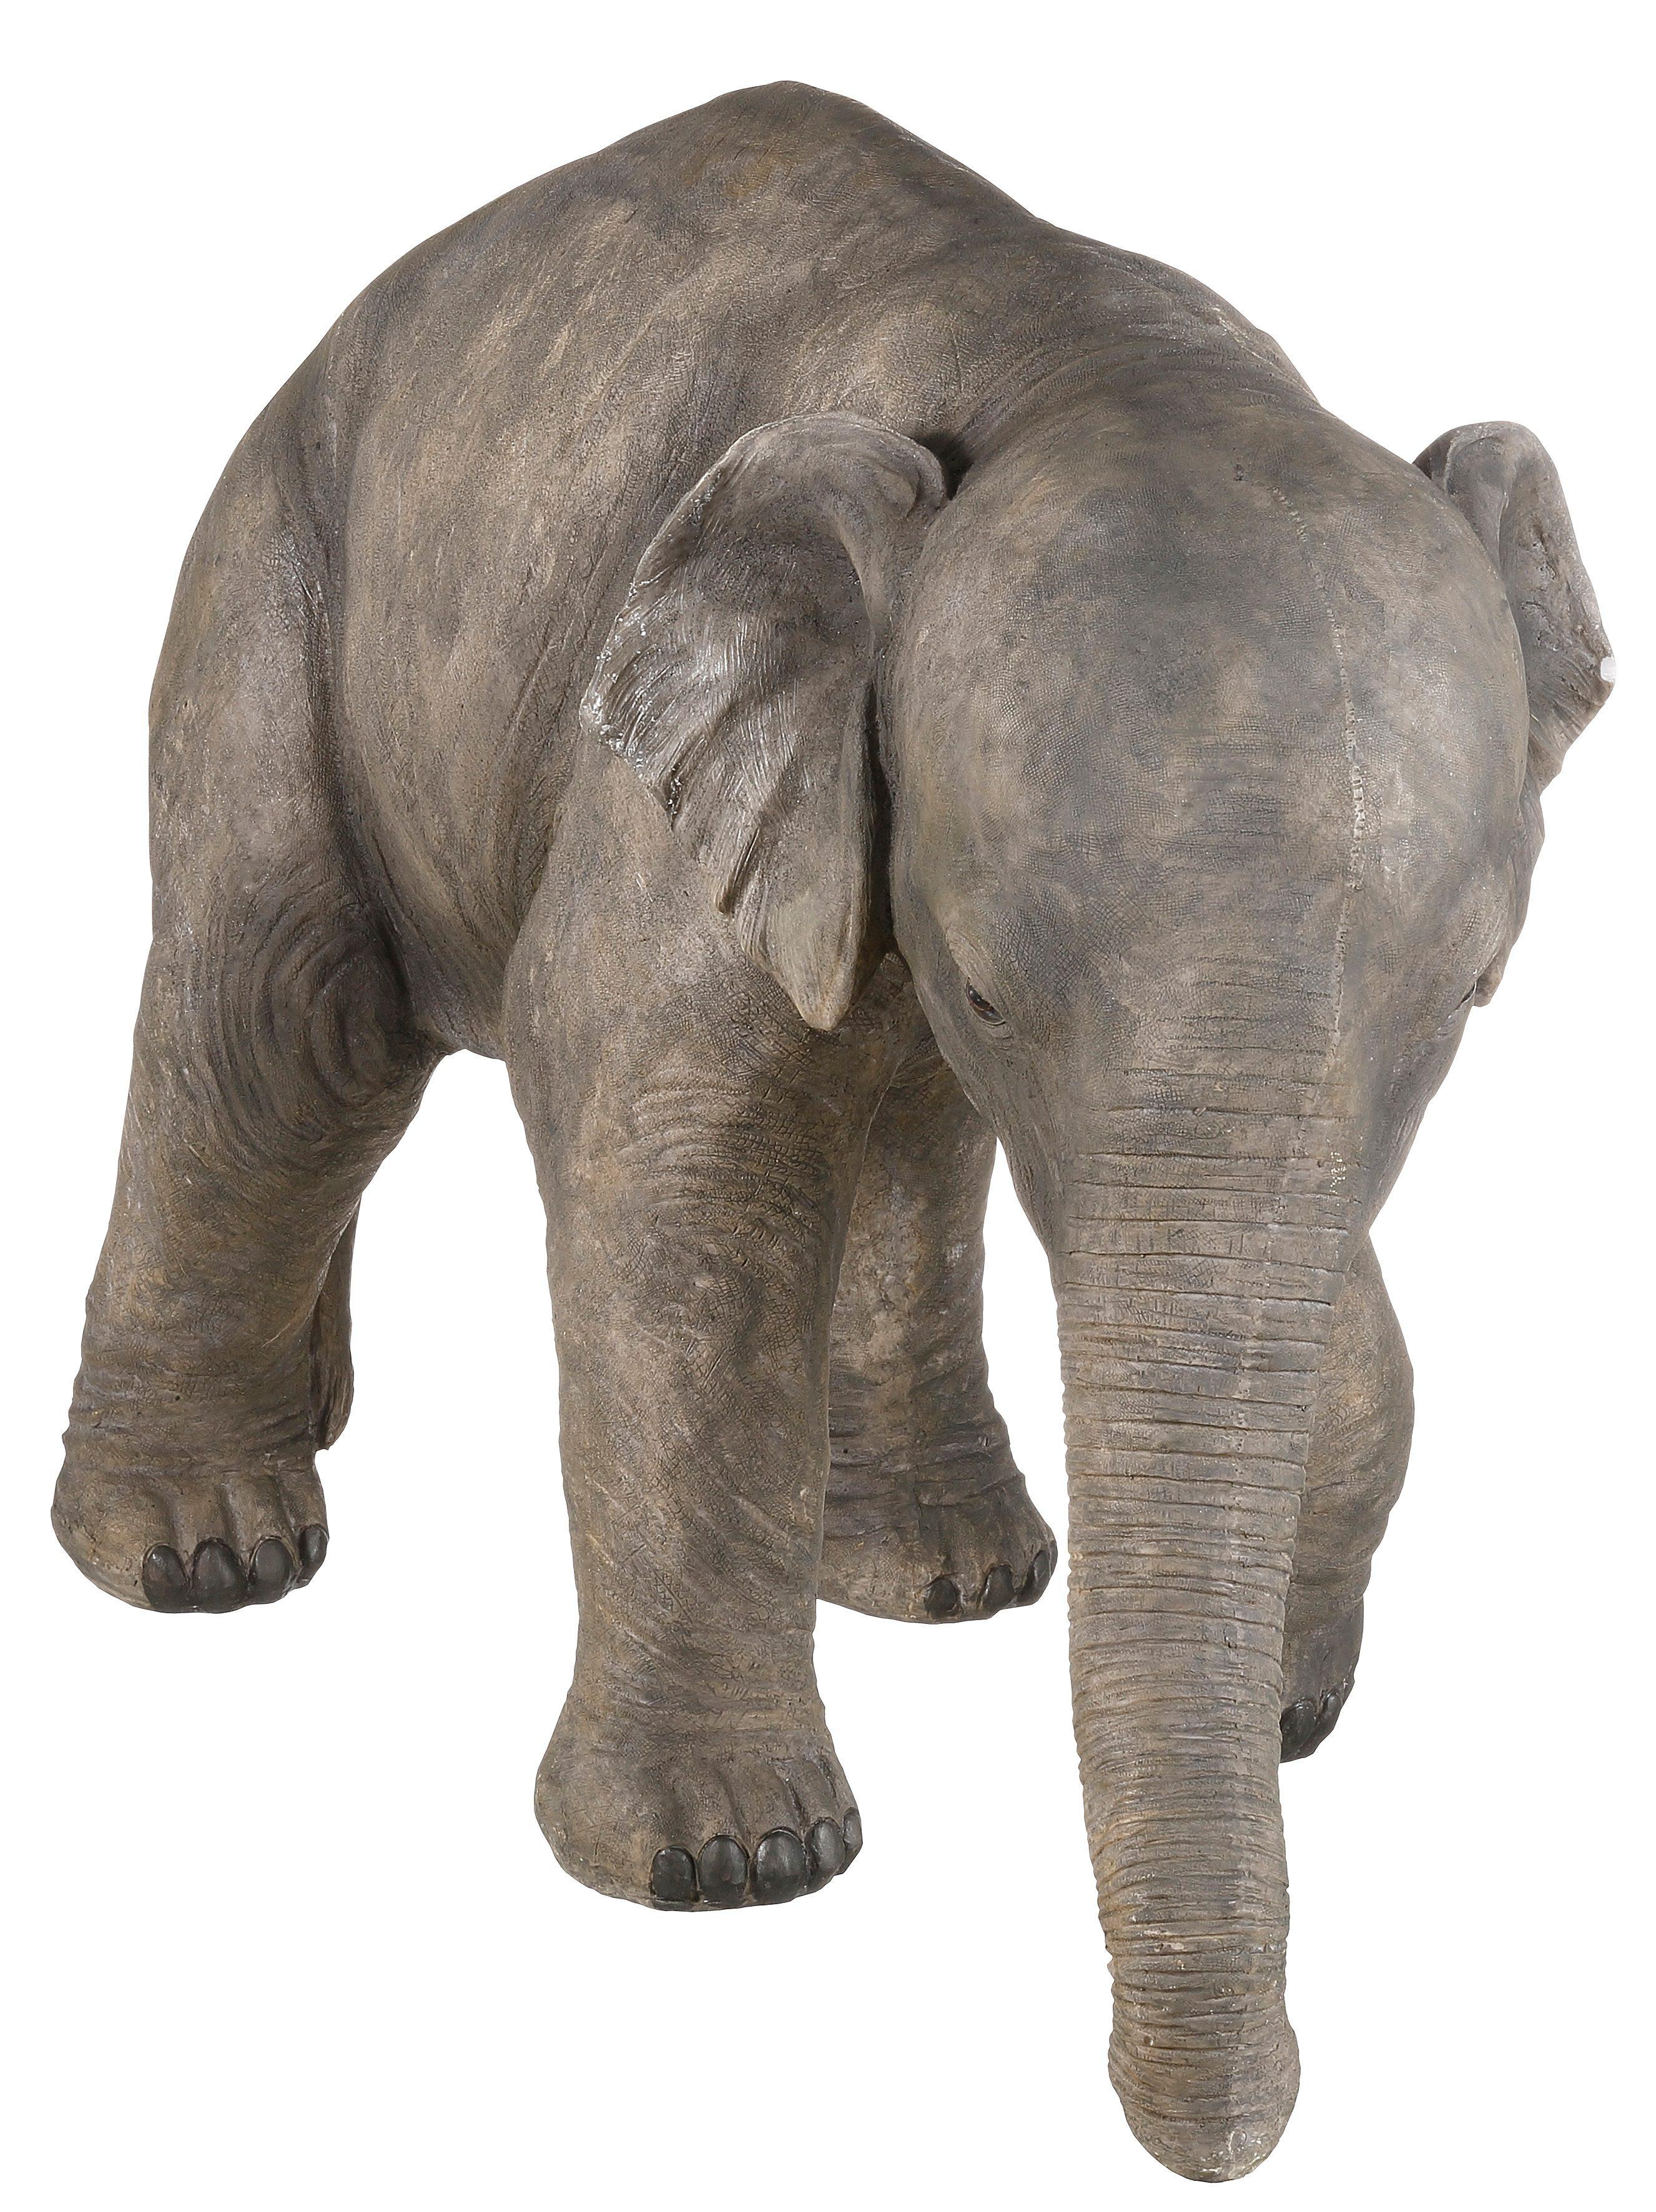 Dekofigur, Home affaire, »Elefant« | Dekoration > Figuren und Skulpturen > Tiere | Grau | Kunststein | HOME AFFAIRE